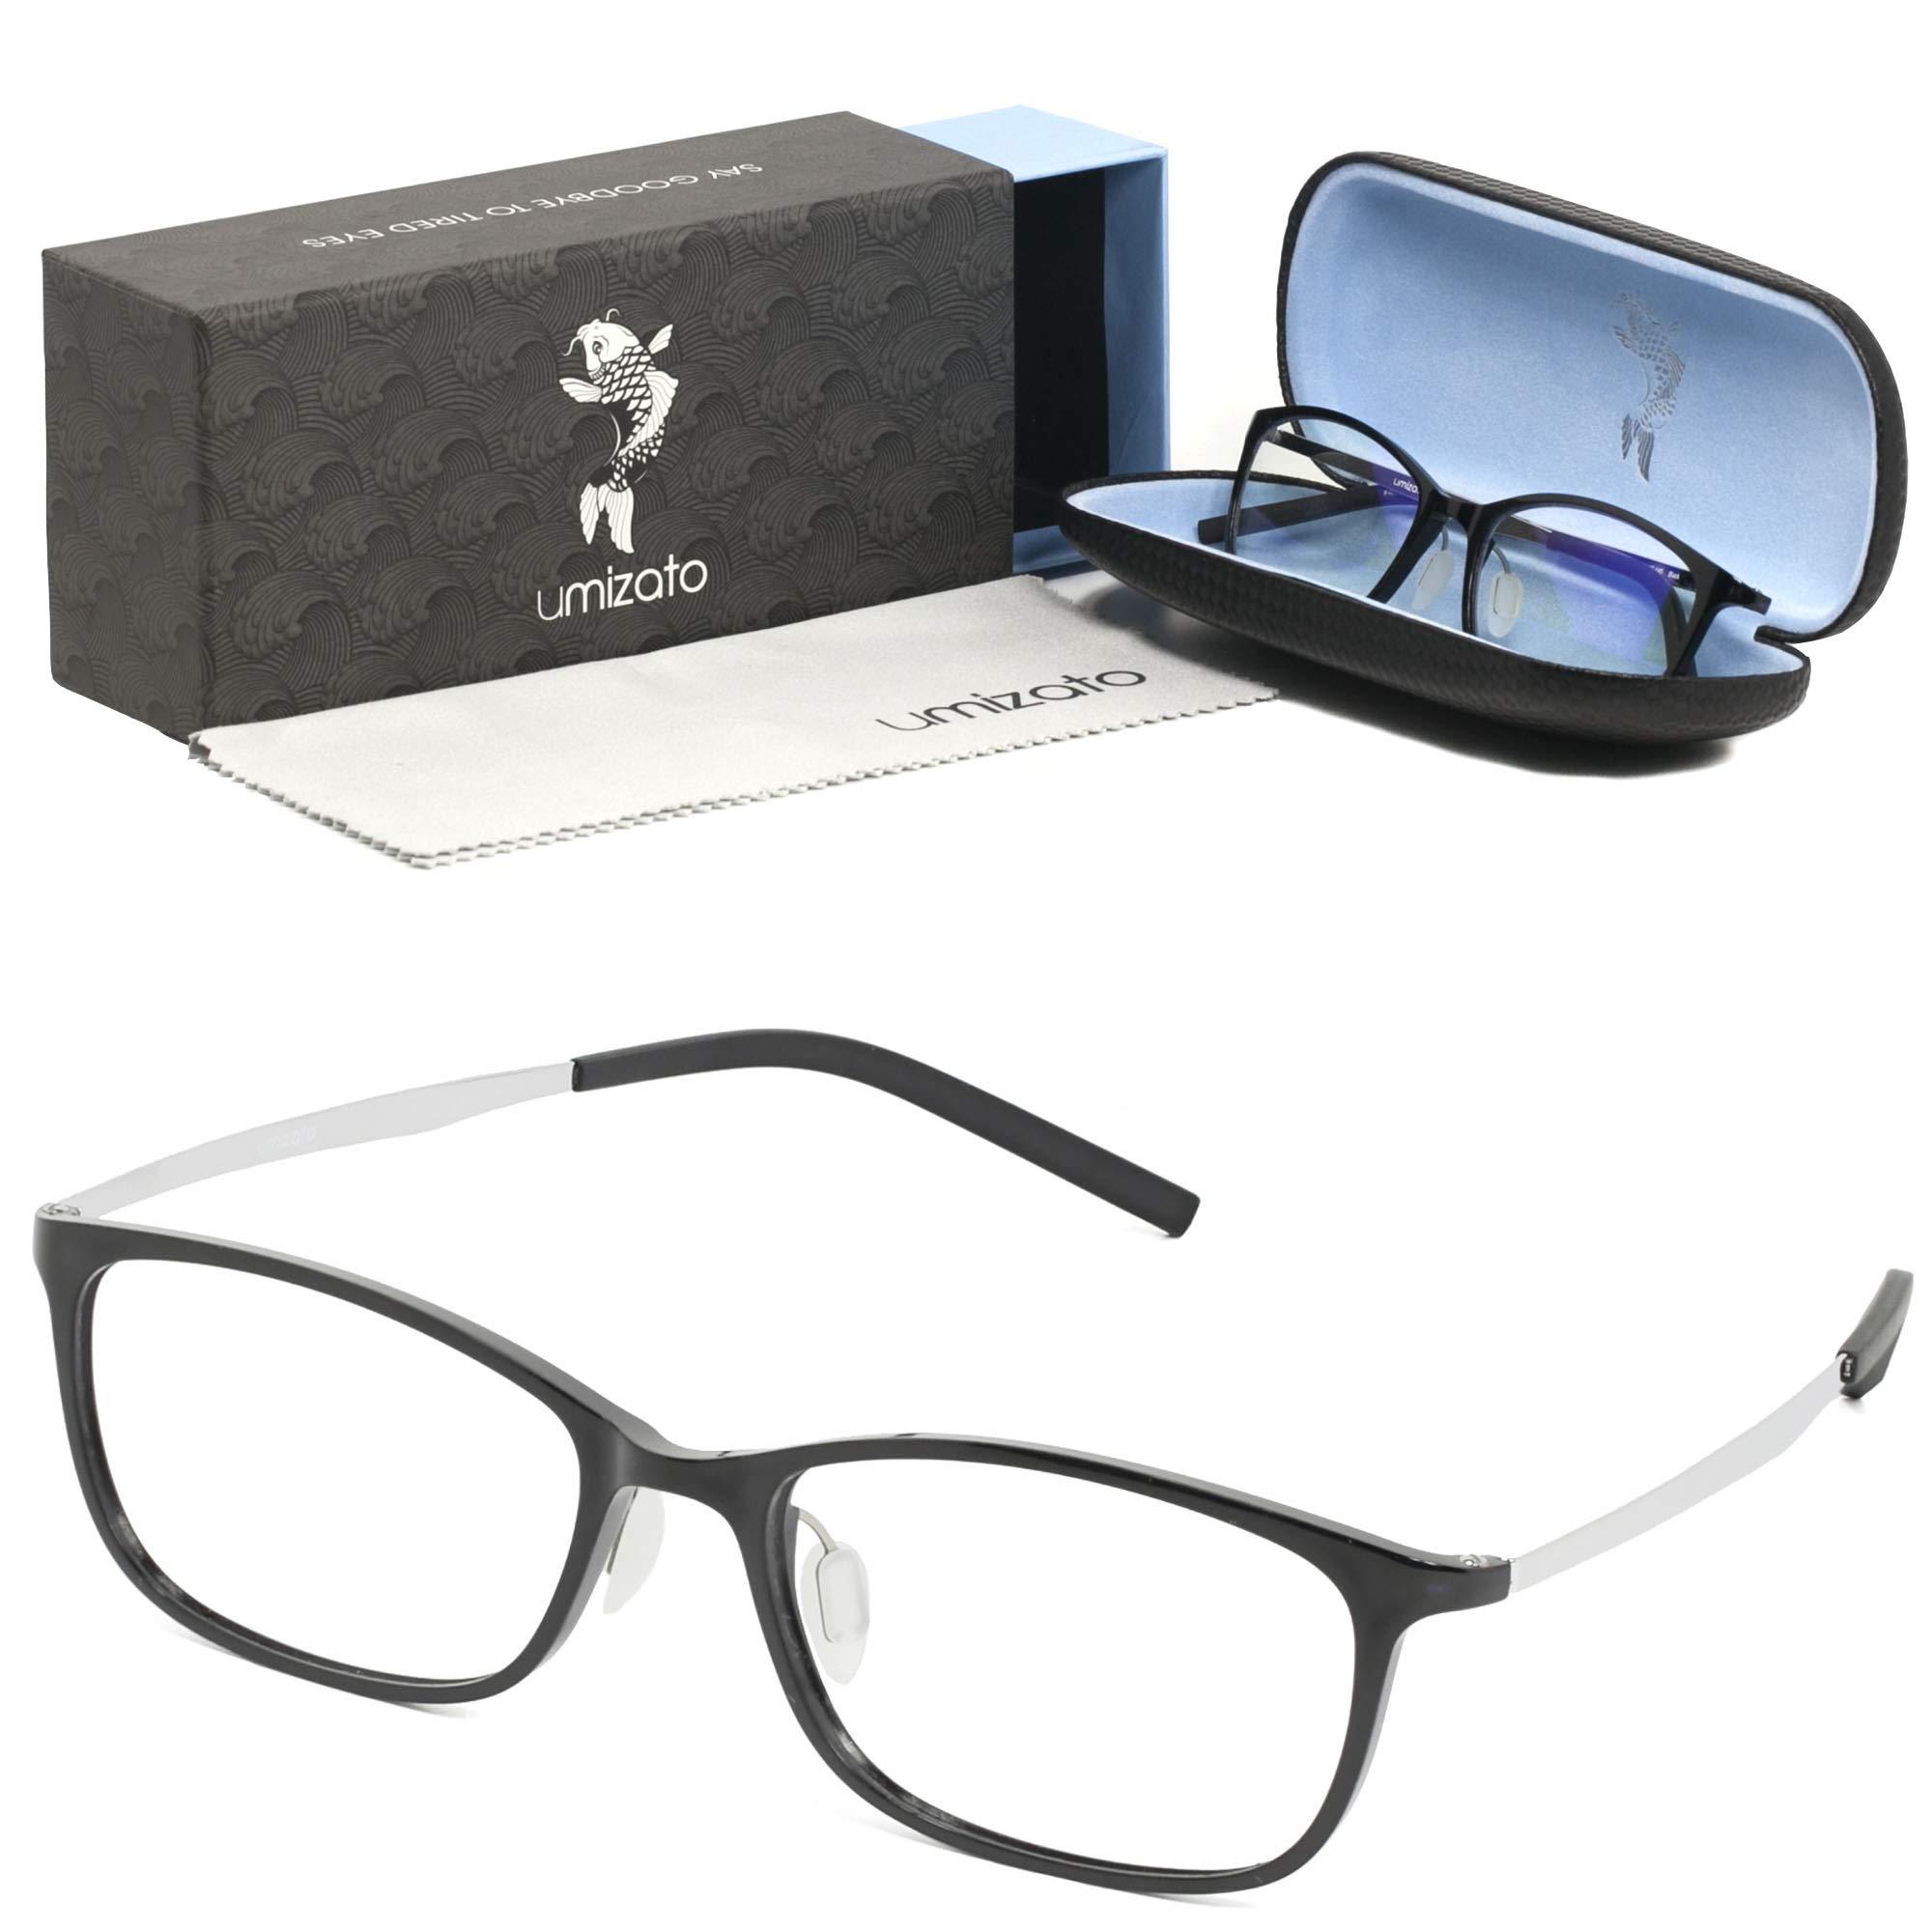 UMIZATO Blue Light Blocking Computer Gaming Glasses for Men Women - Clear Lens, PC Accessories - FDA Approved - Relieves Digital Eye Strain, UV Blocker, Anti-Glare, Anti-Fatigue (Orion in Black)